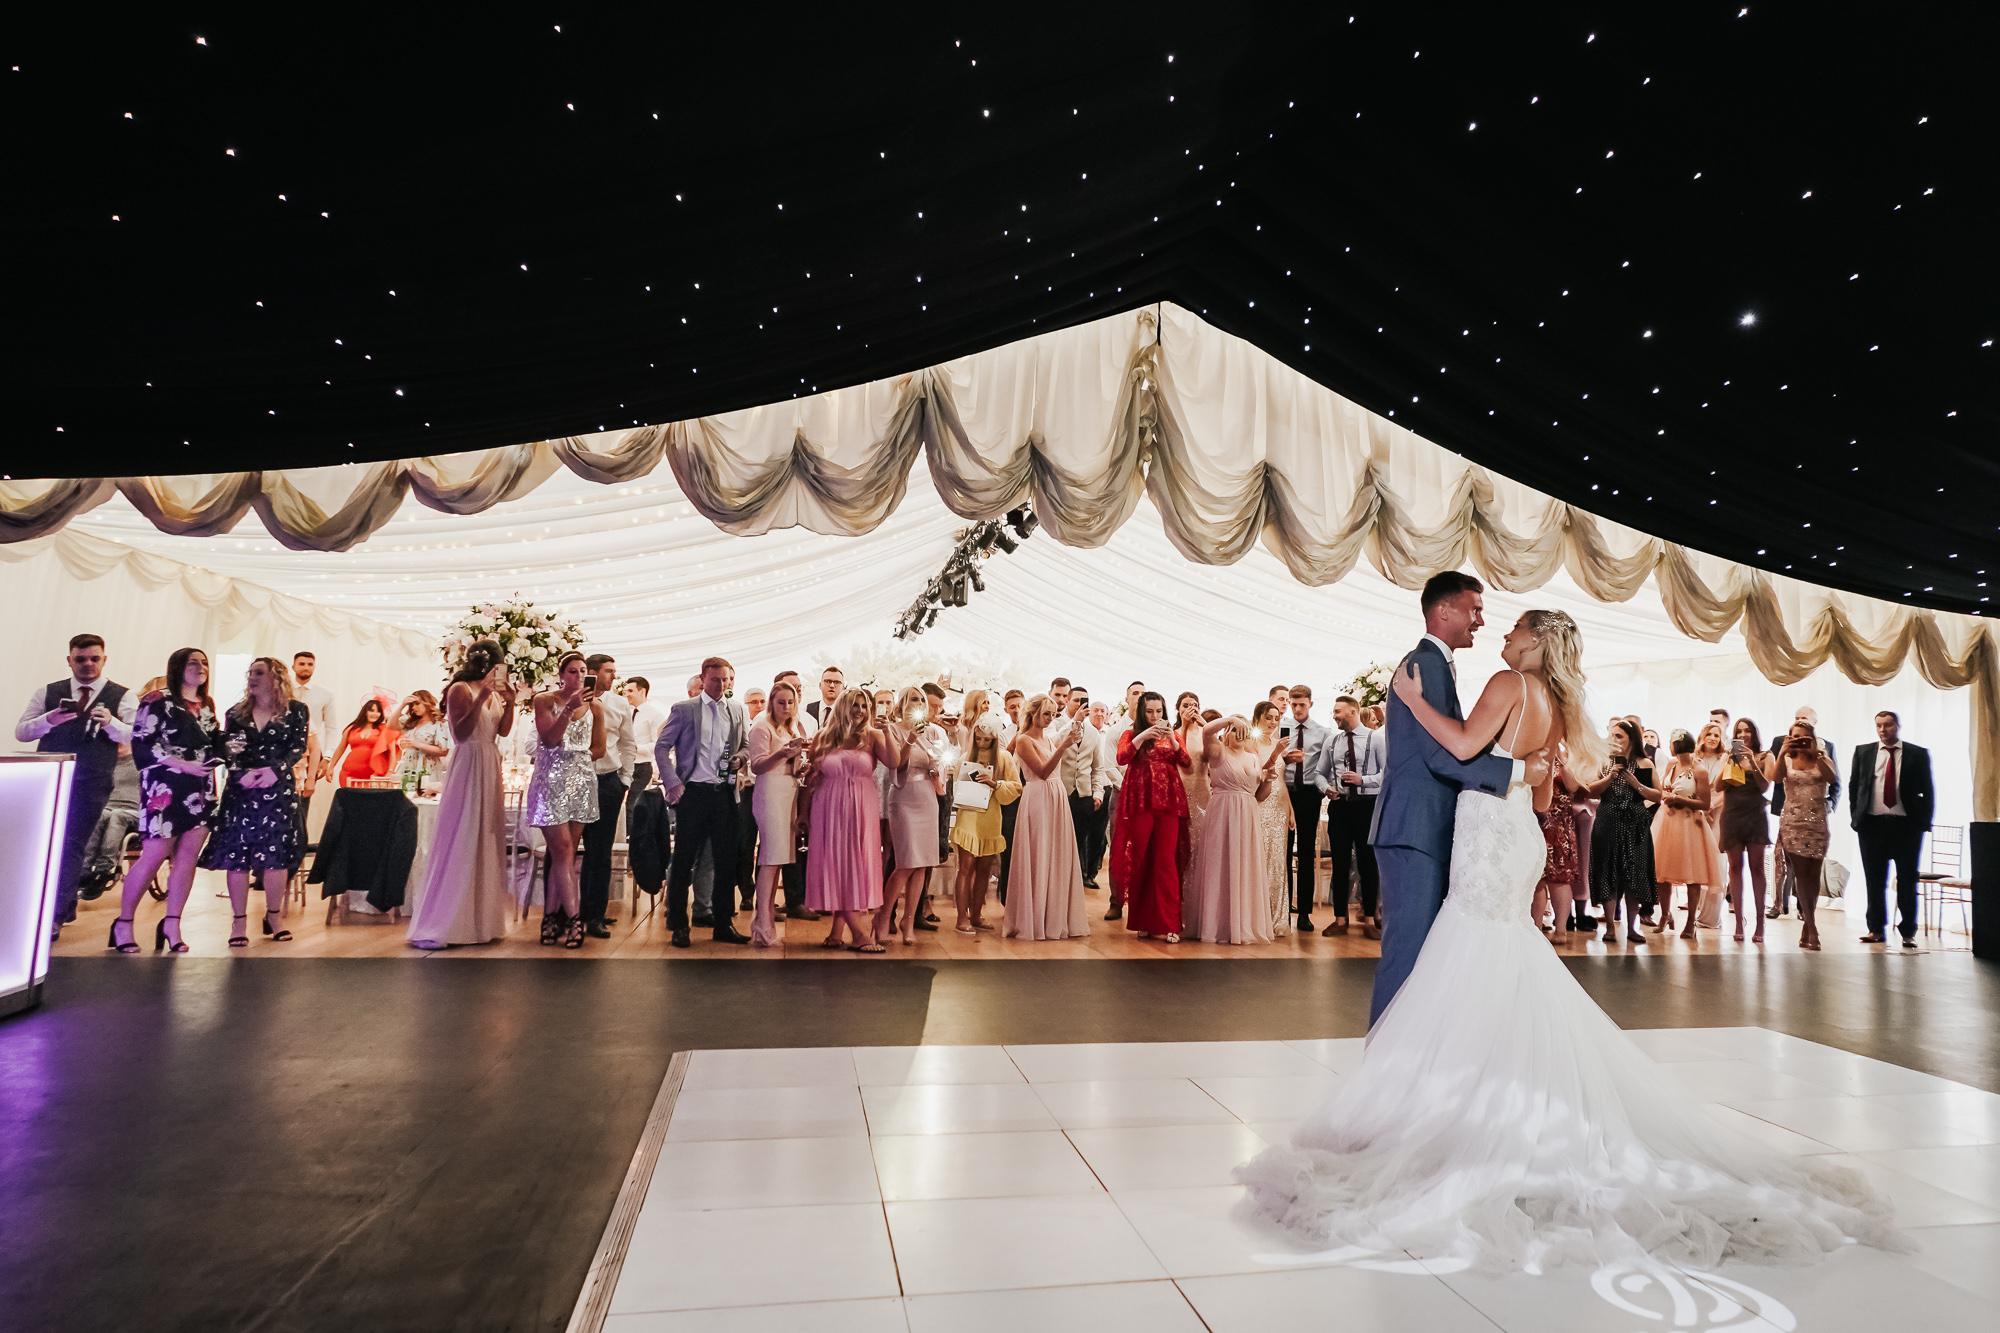 Thornton Manor Lakeside Marquee Wedding Photographer  (49 of 53).jpg